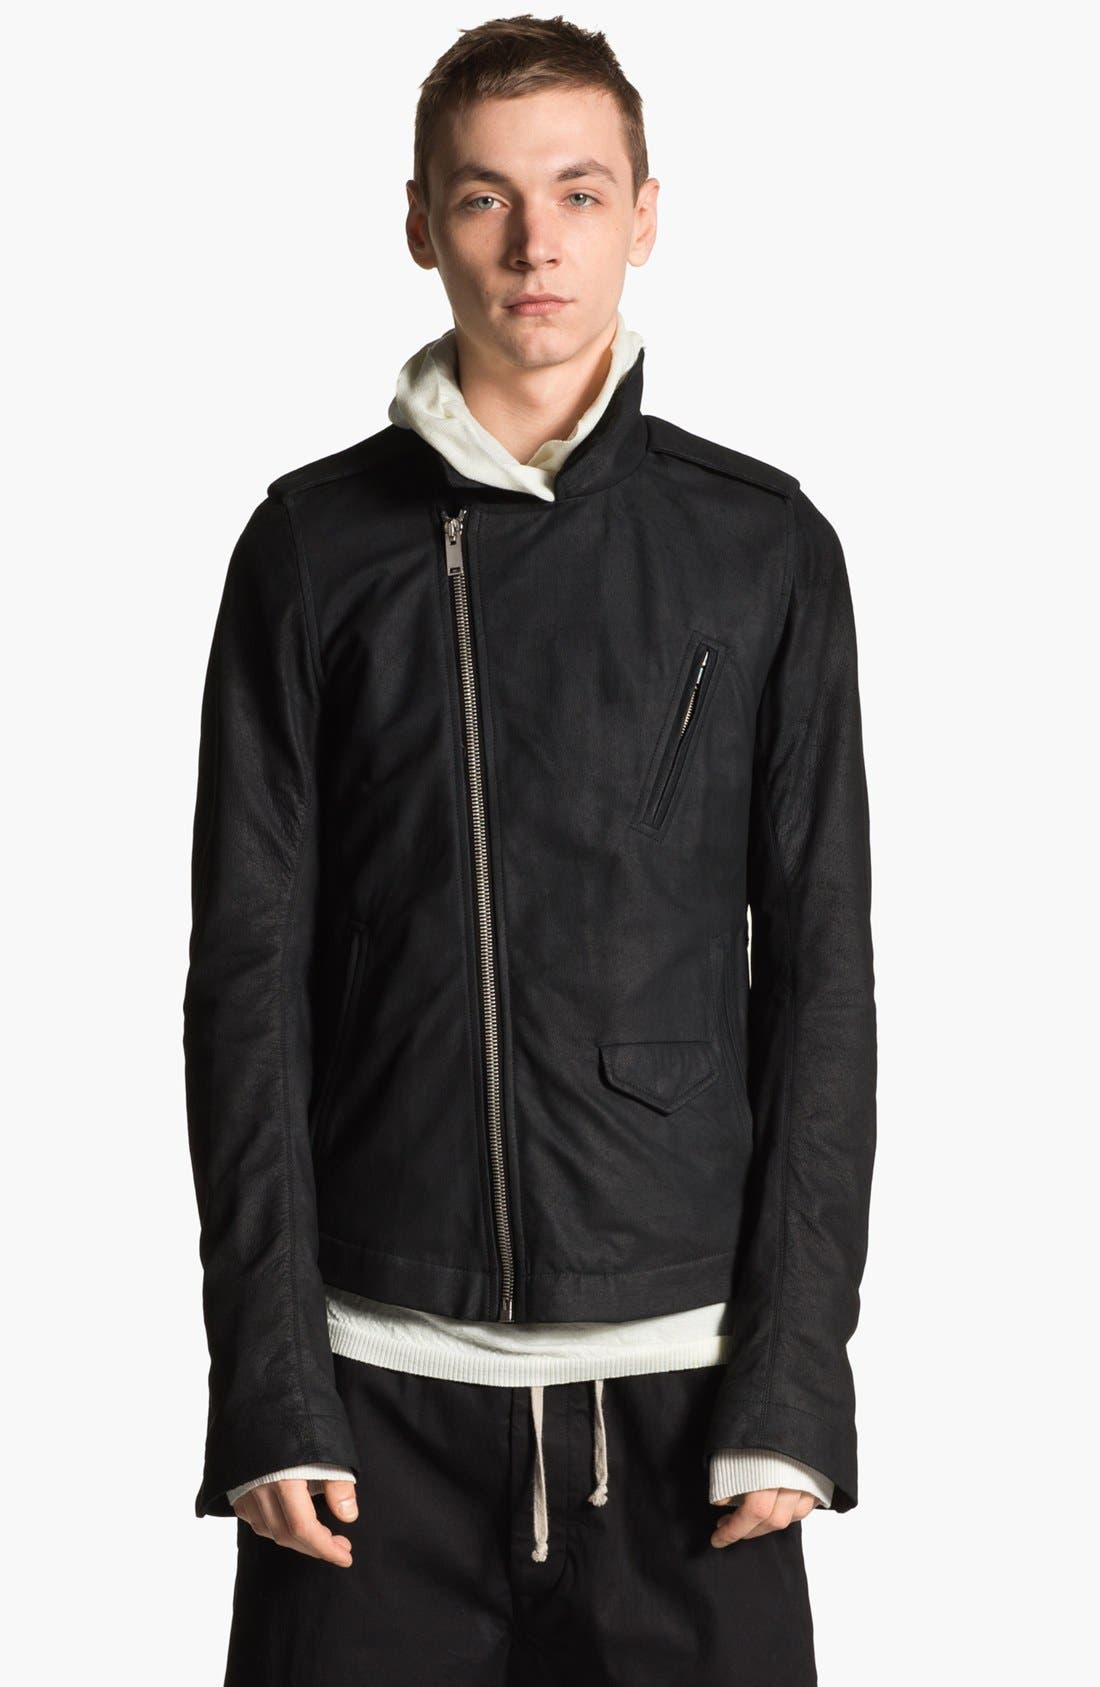 Main Image - Rick Owens Lambskin Leather Biker Jacket